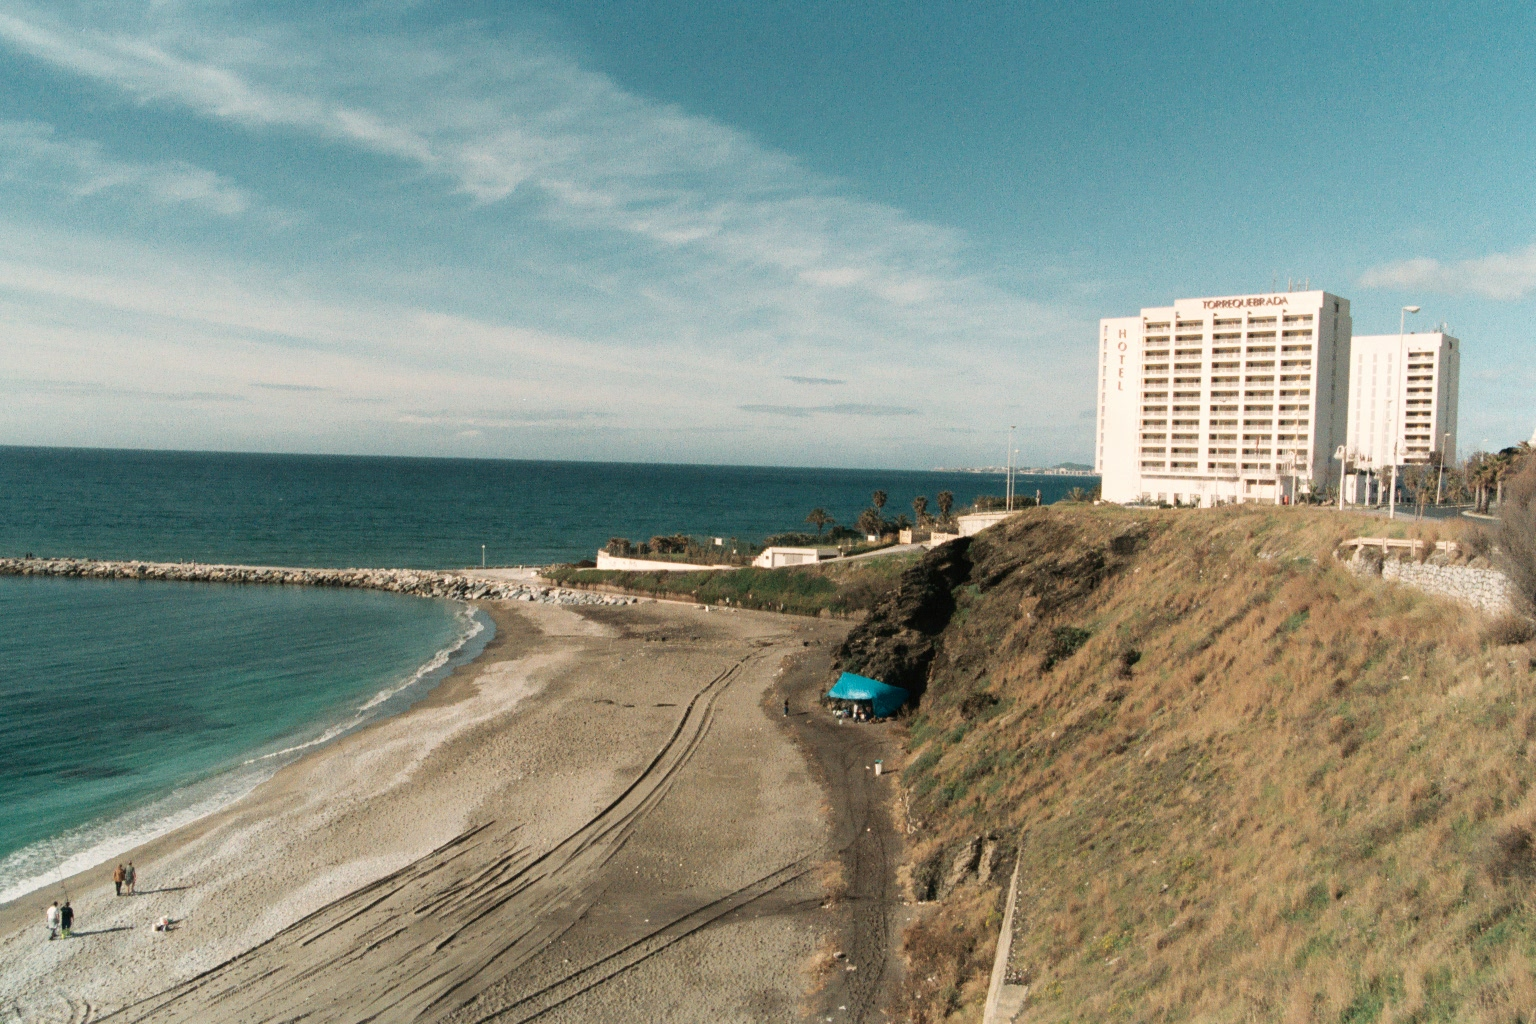 Foto playa Torrequebrada. Spain_Andalusia_Benalmadena_*****Hotel Torrequebrada_25_22A.JPG